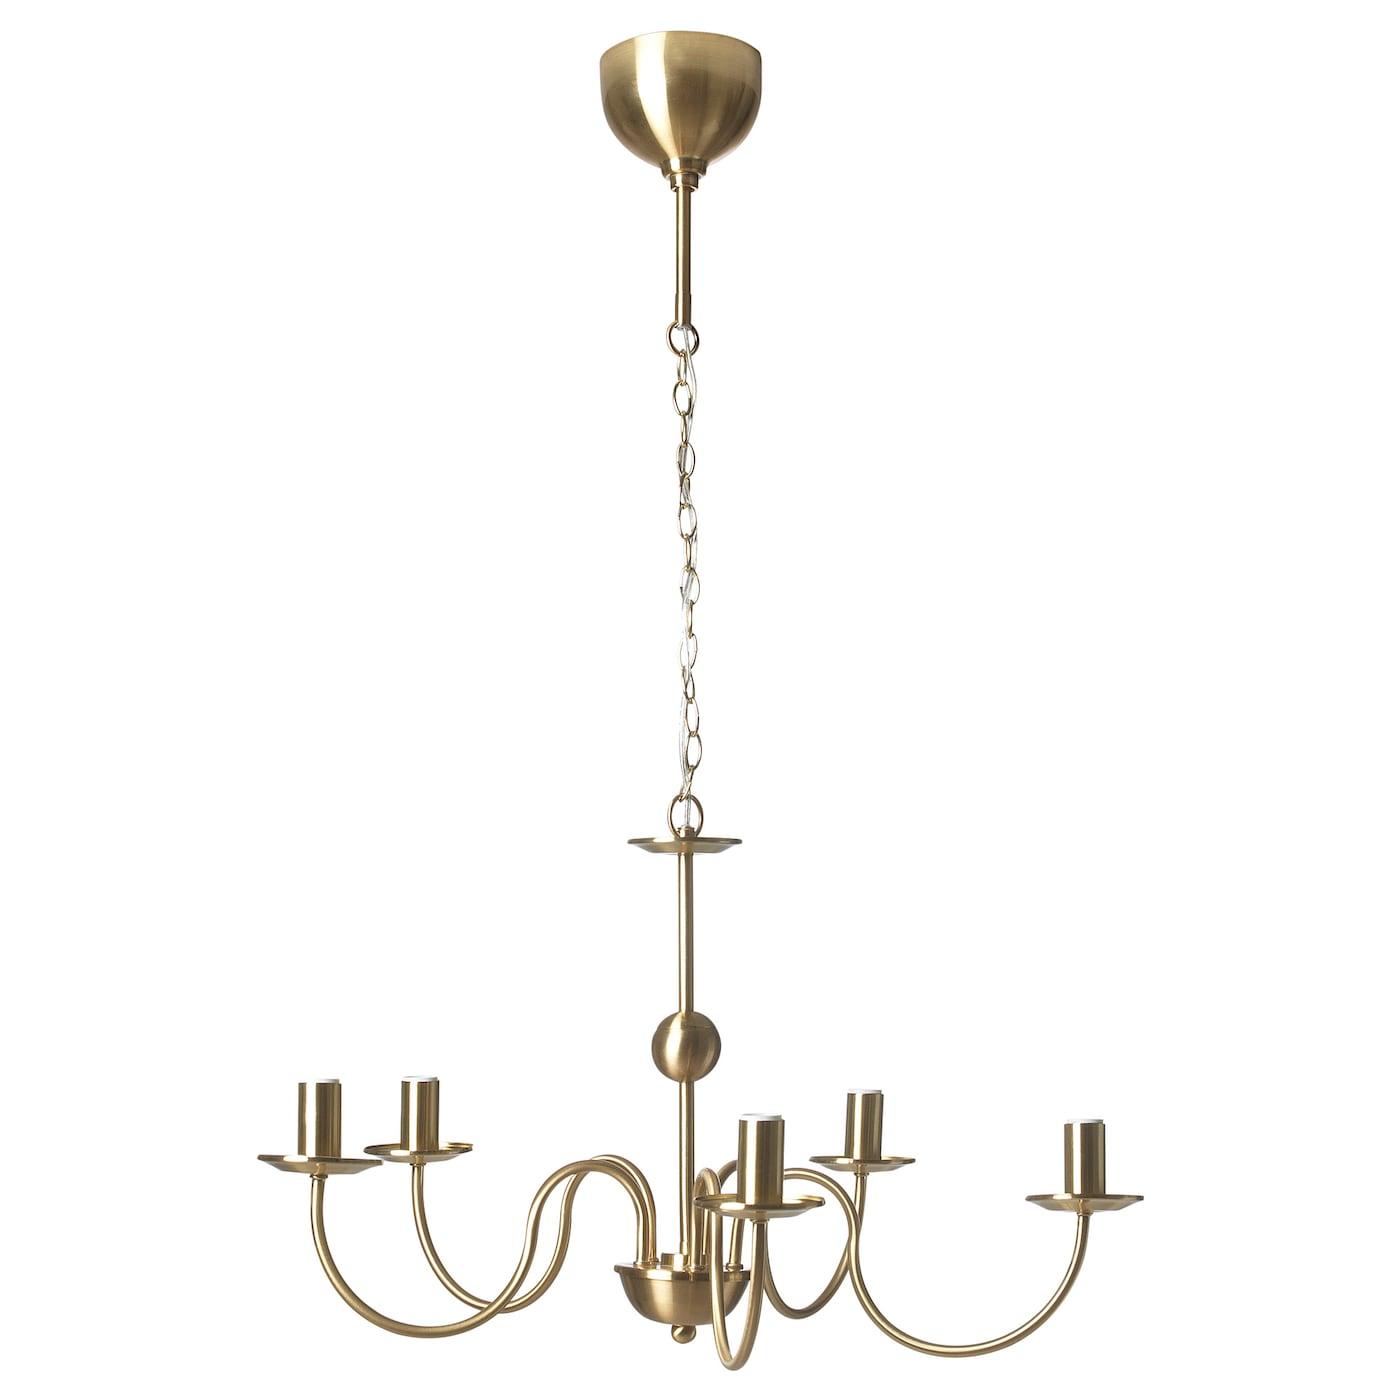 Dotorp chandelier 5 armed brass colour ikea ikea dotorp chandelier 5 armed easy to adjust the height with the hooks aloadofball Choice Image